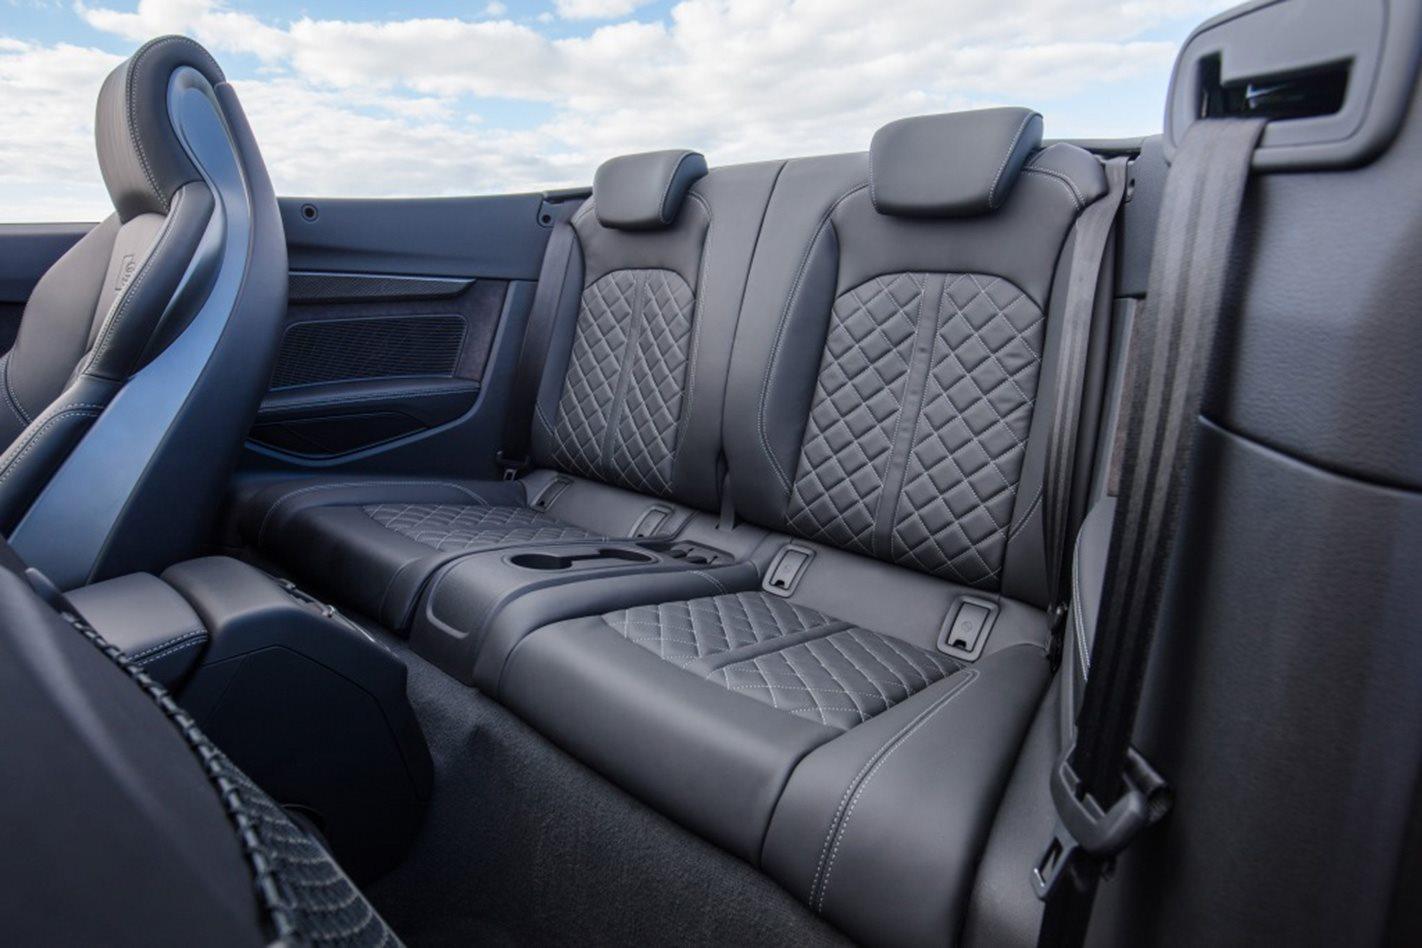 2017 Audi S5 Cabriolet rear seats